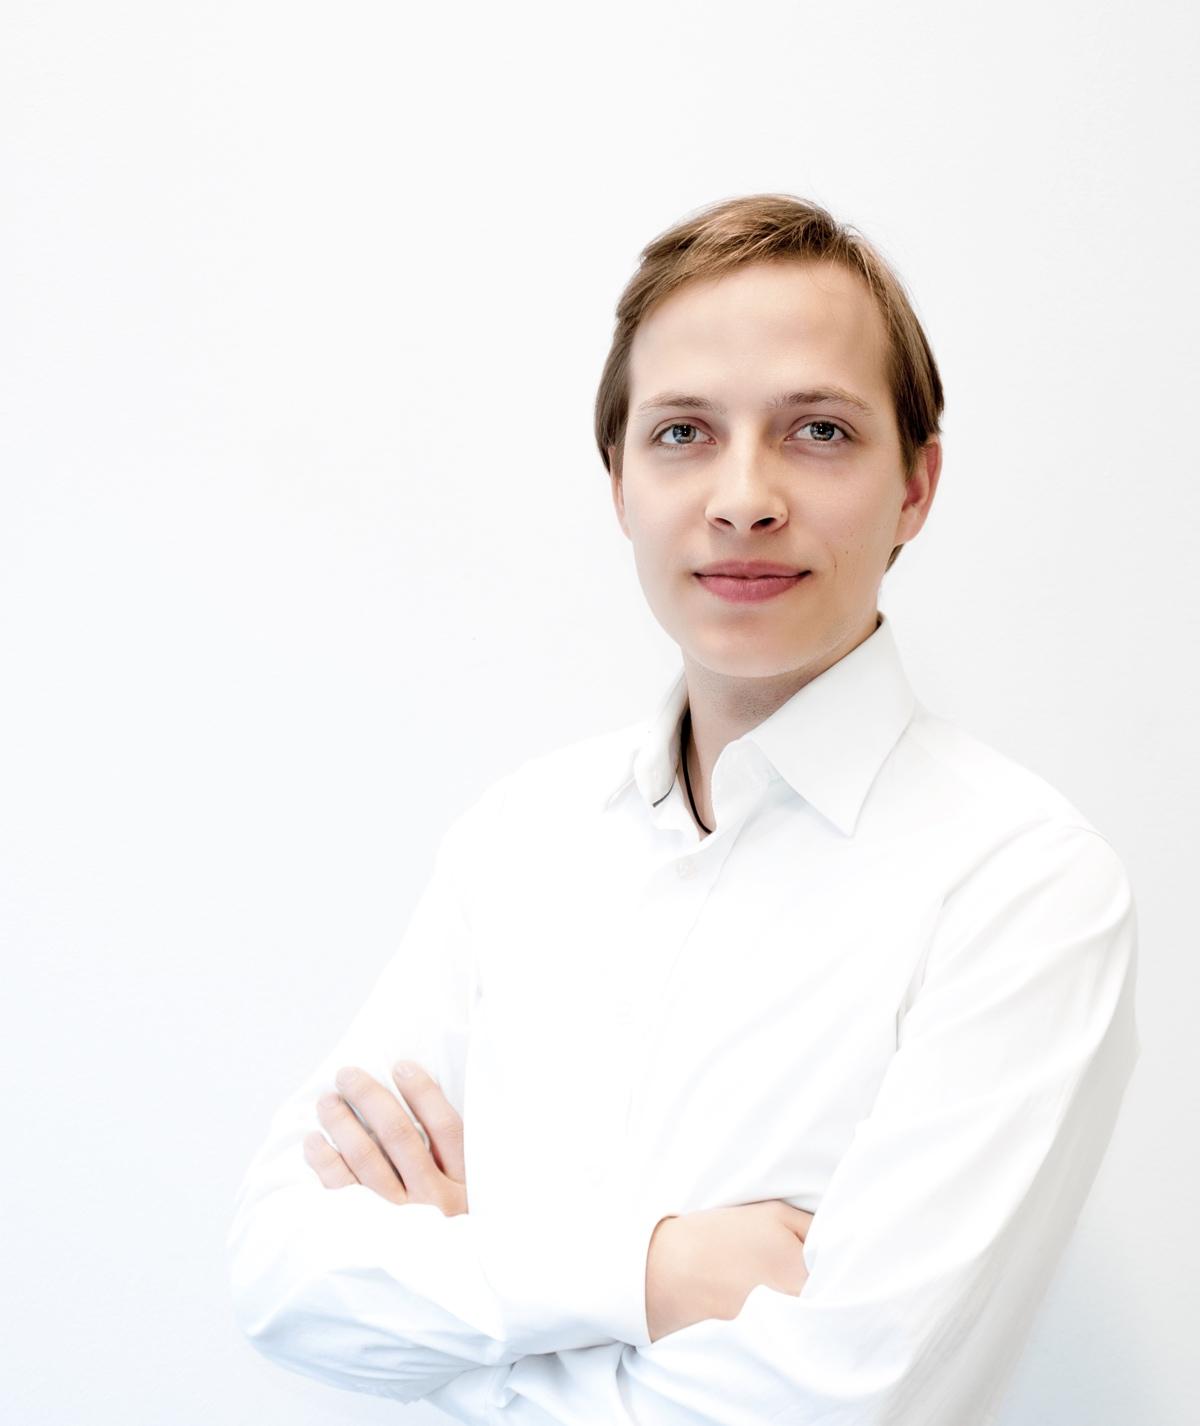 Moritz Hytry